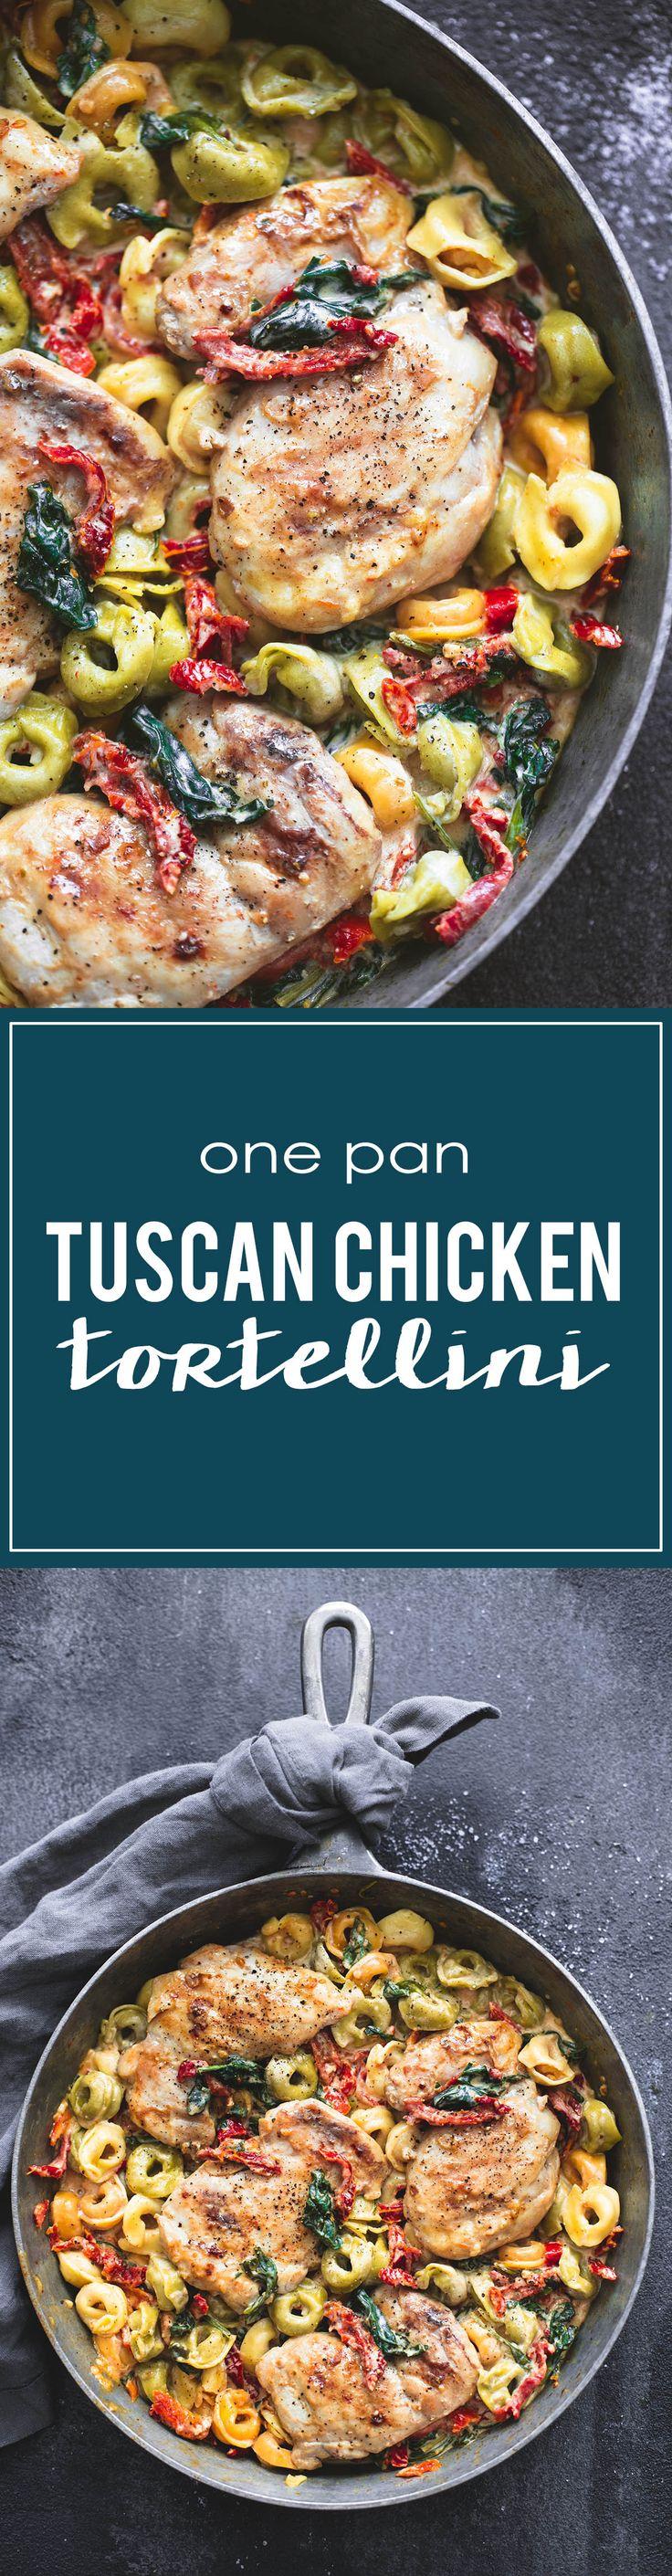 One Pan Tuscan Chicken Tortellini | lecremedelacrumb.com